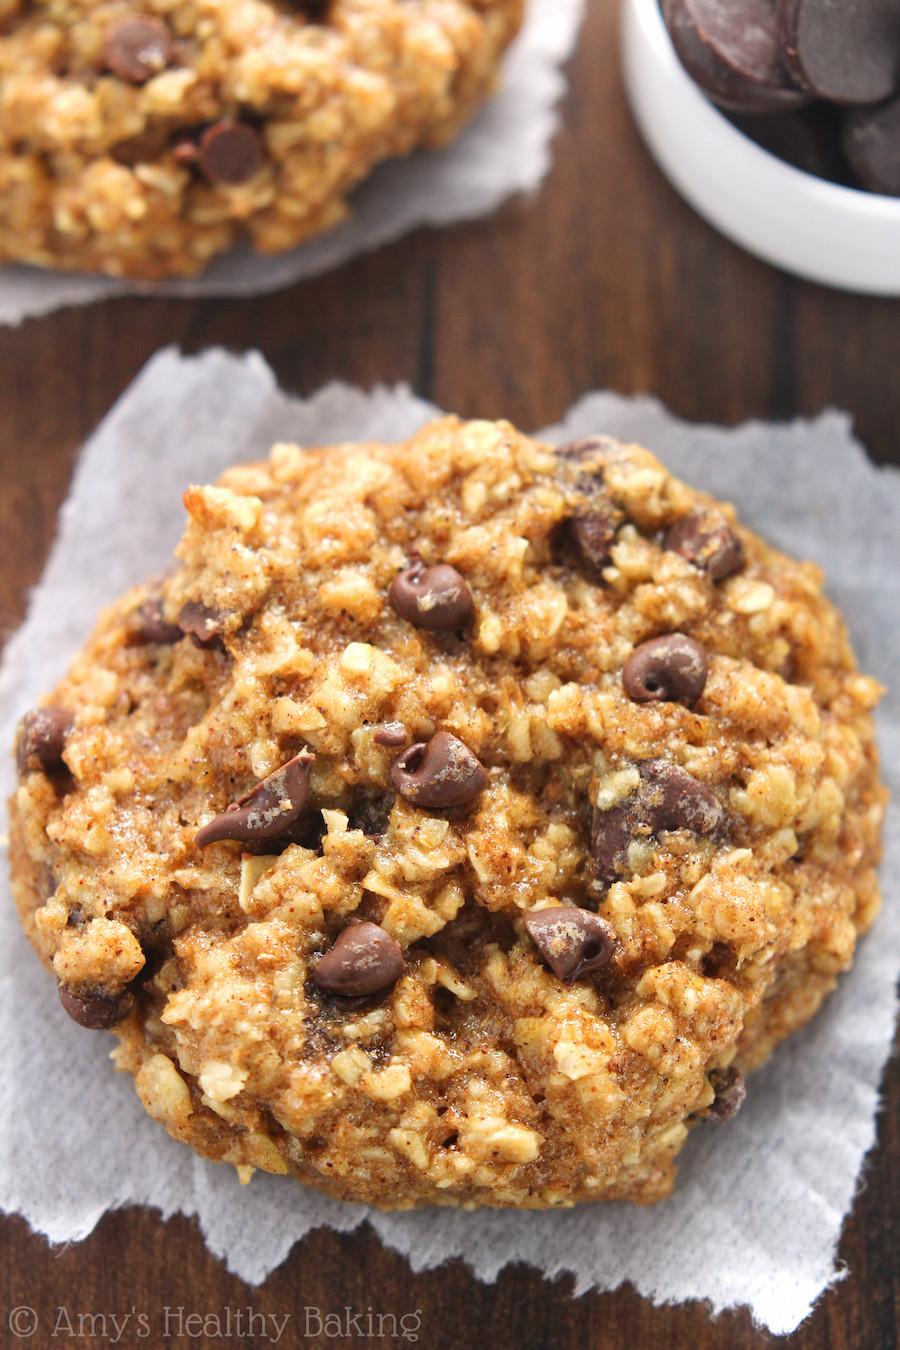 Oatmeal Cookies Recipe Healthy  Chocolate Chip Banana Bread Oatmeal Cookies